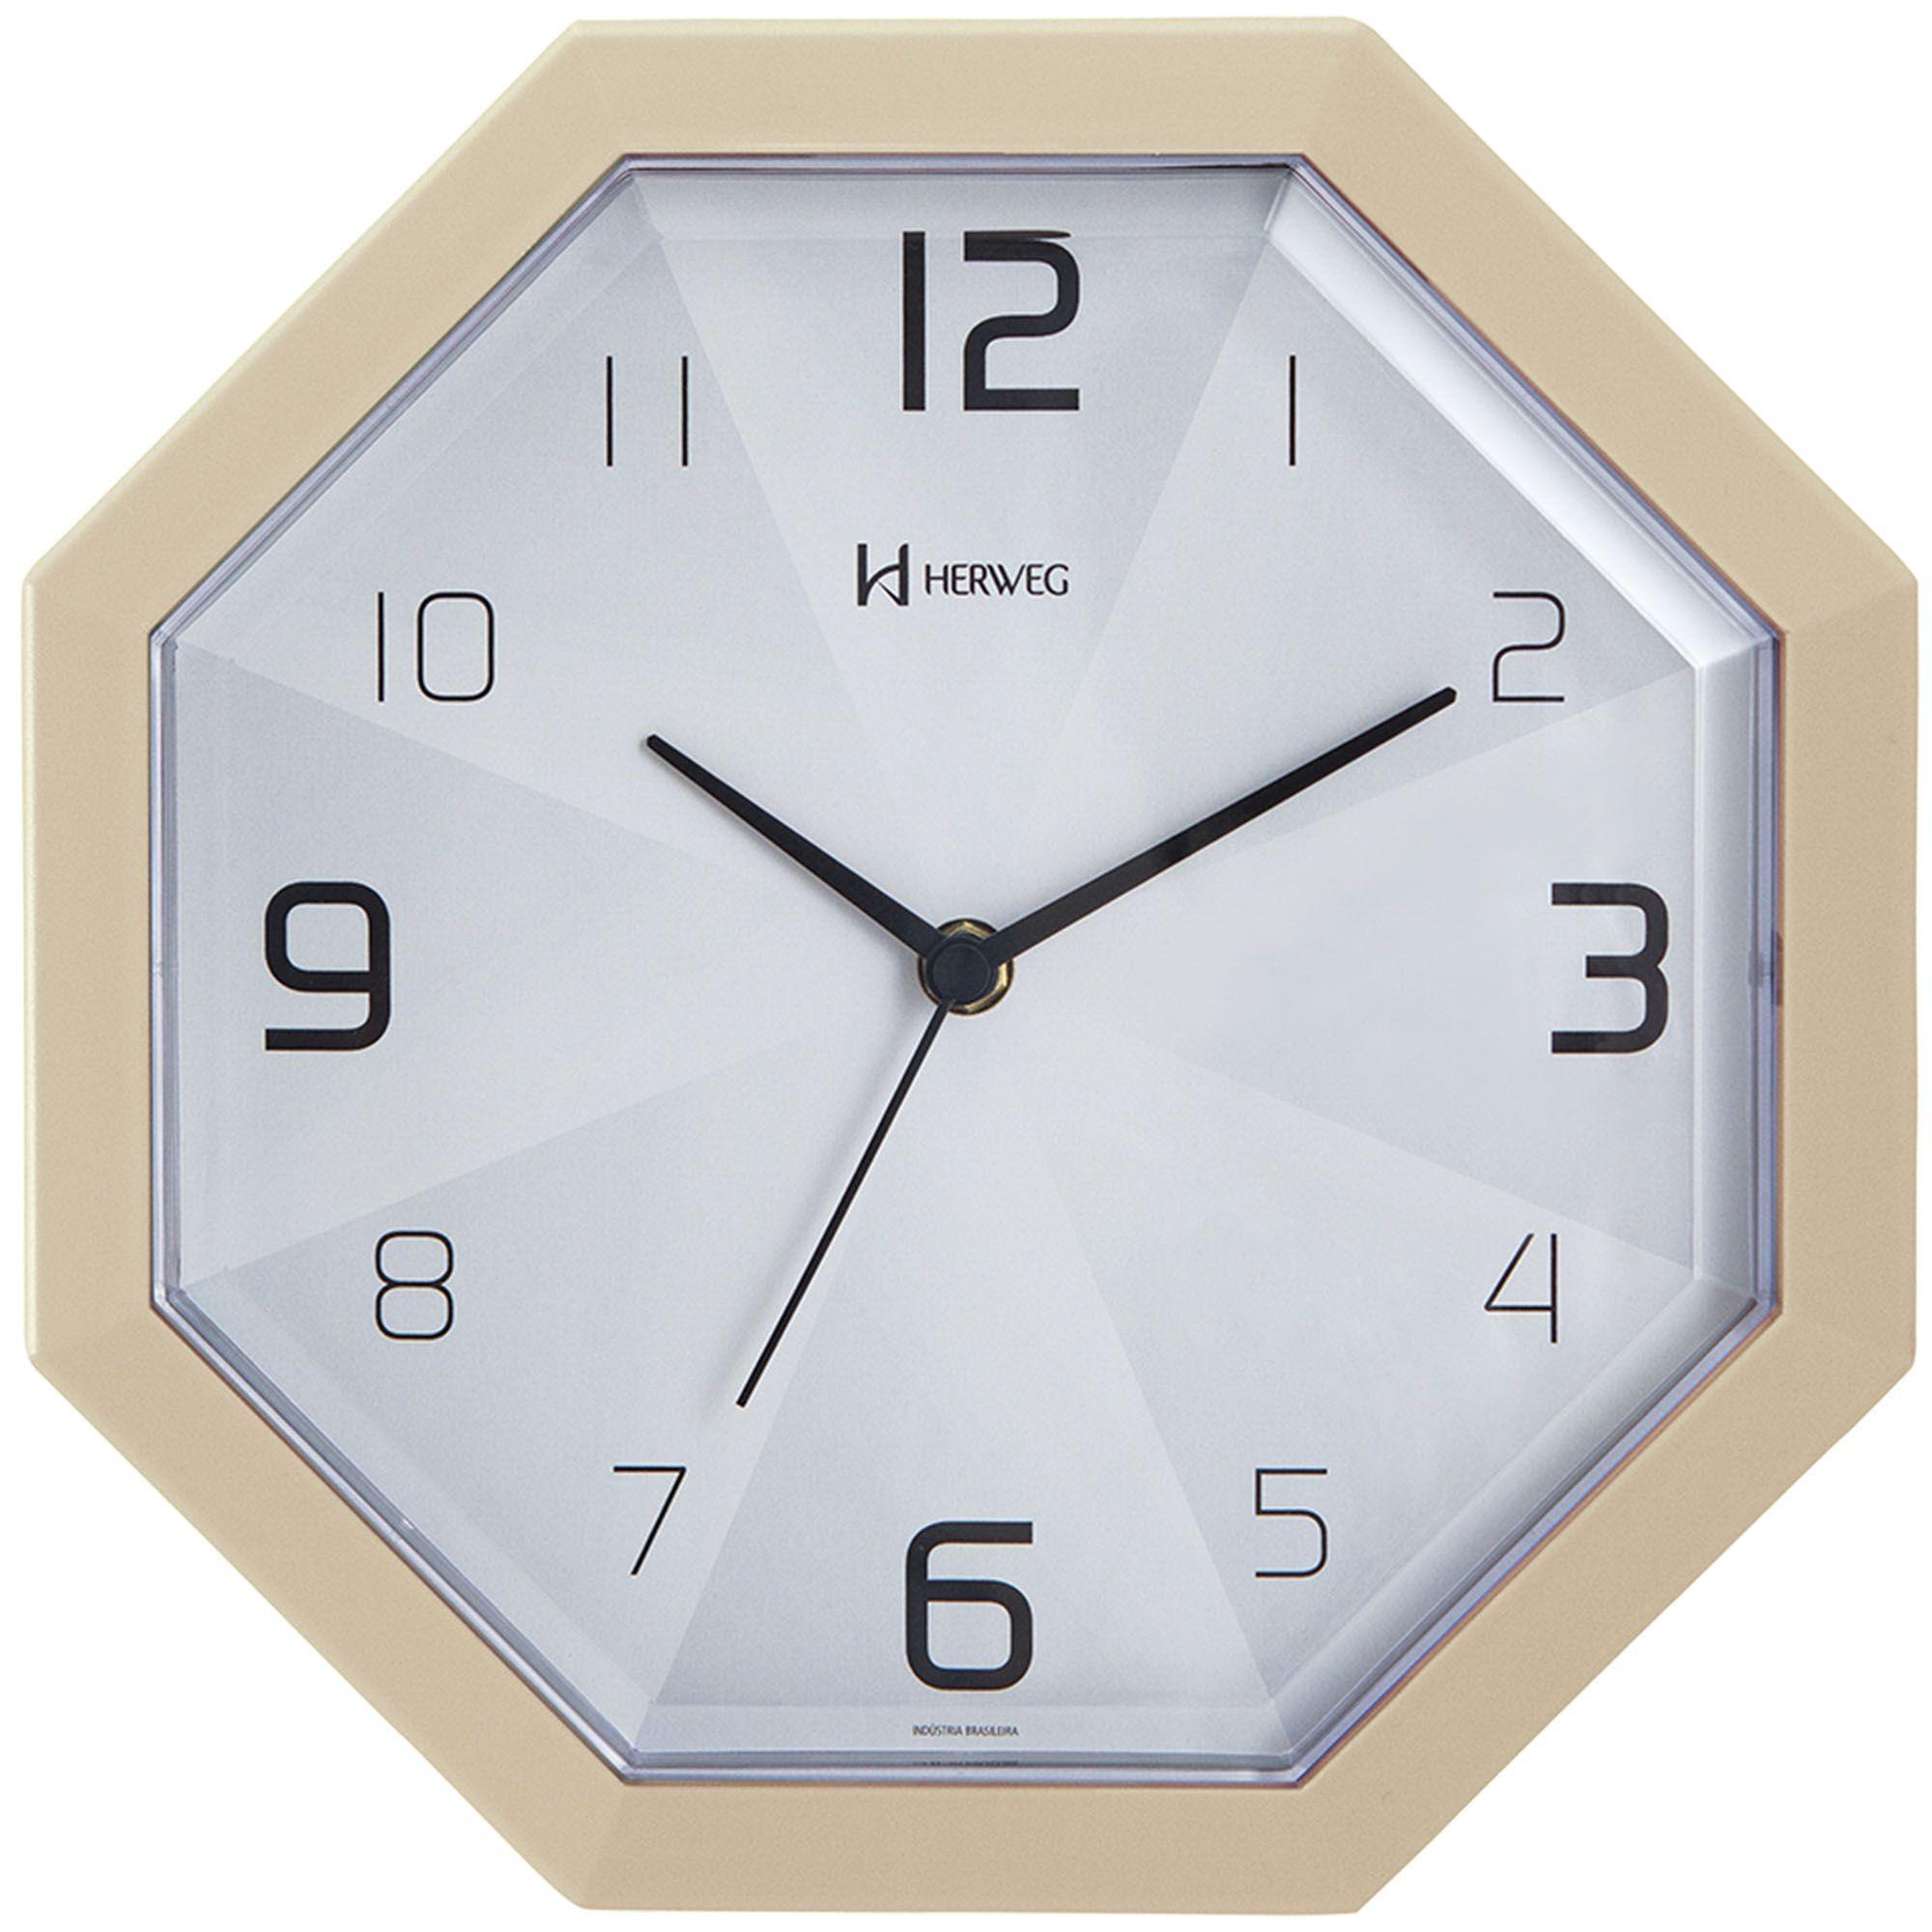 Relógio de Parede Analógico Herweg 6662 032 Marfim